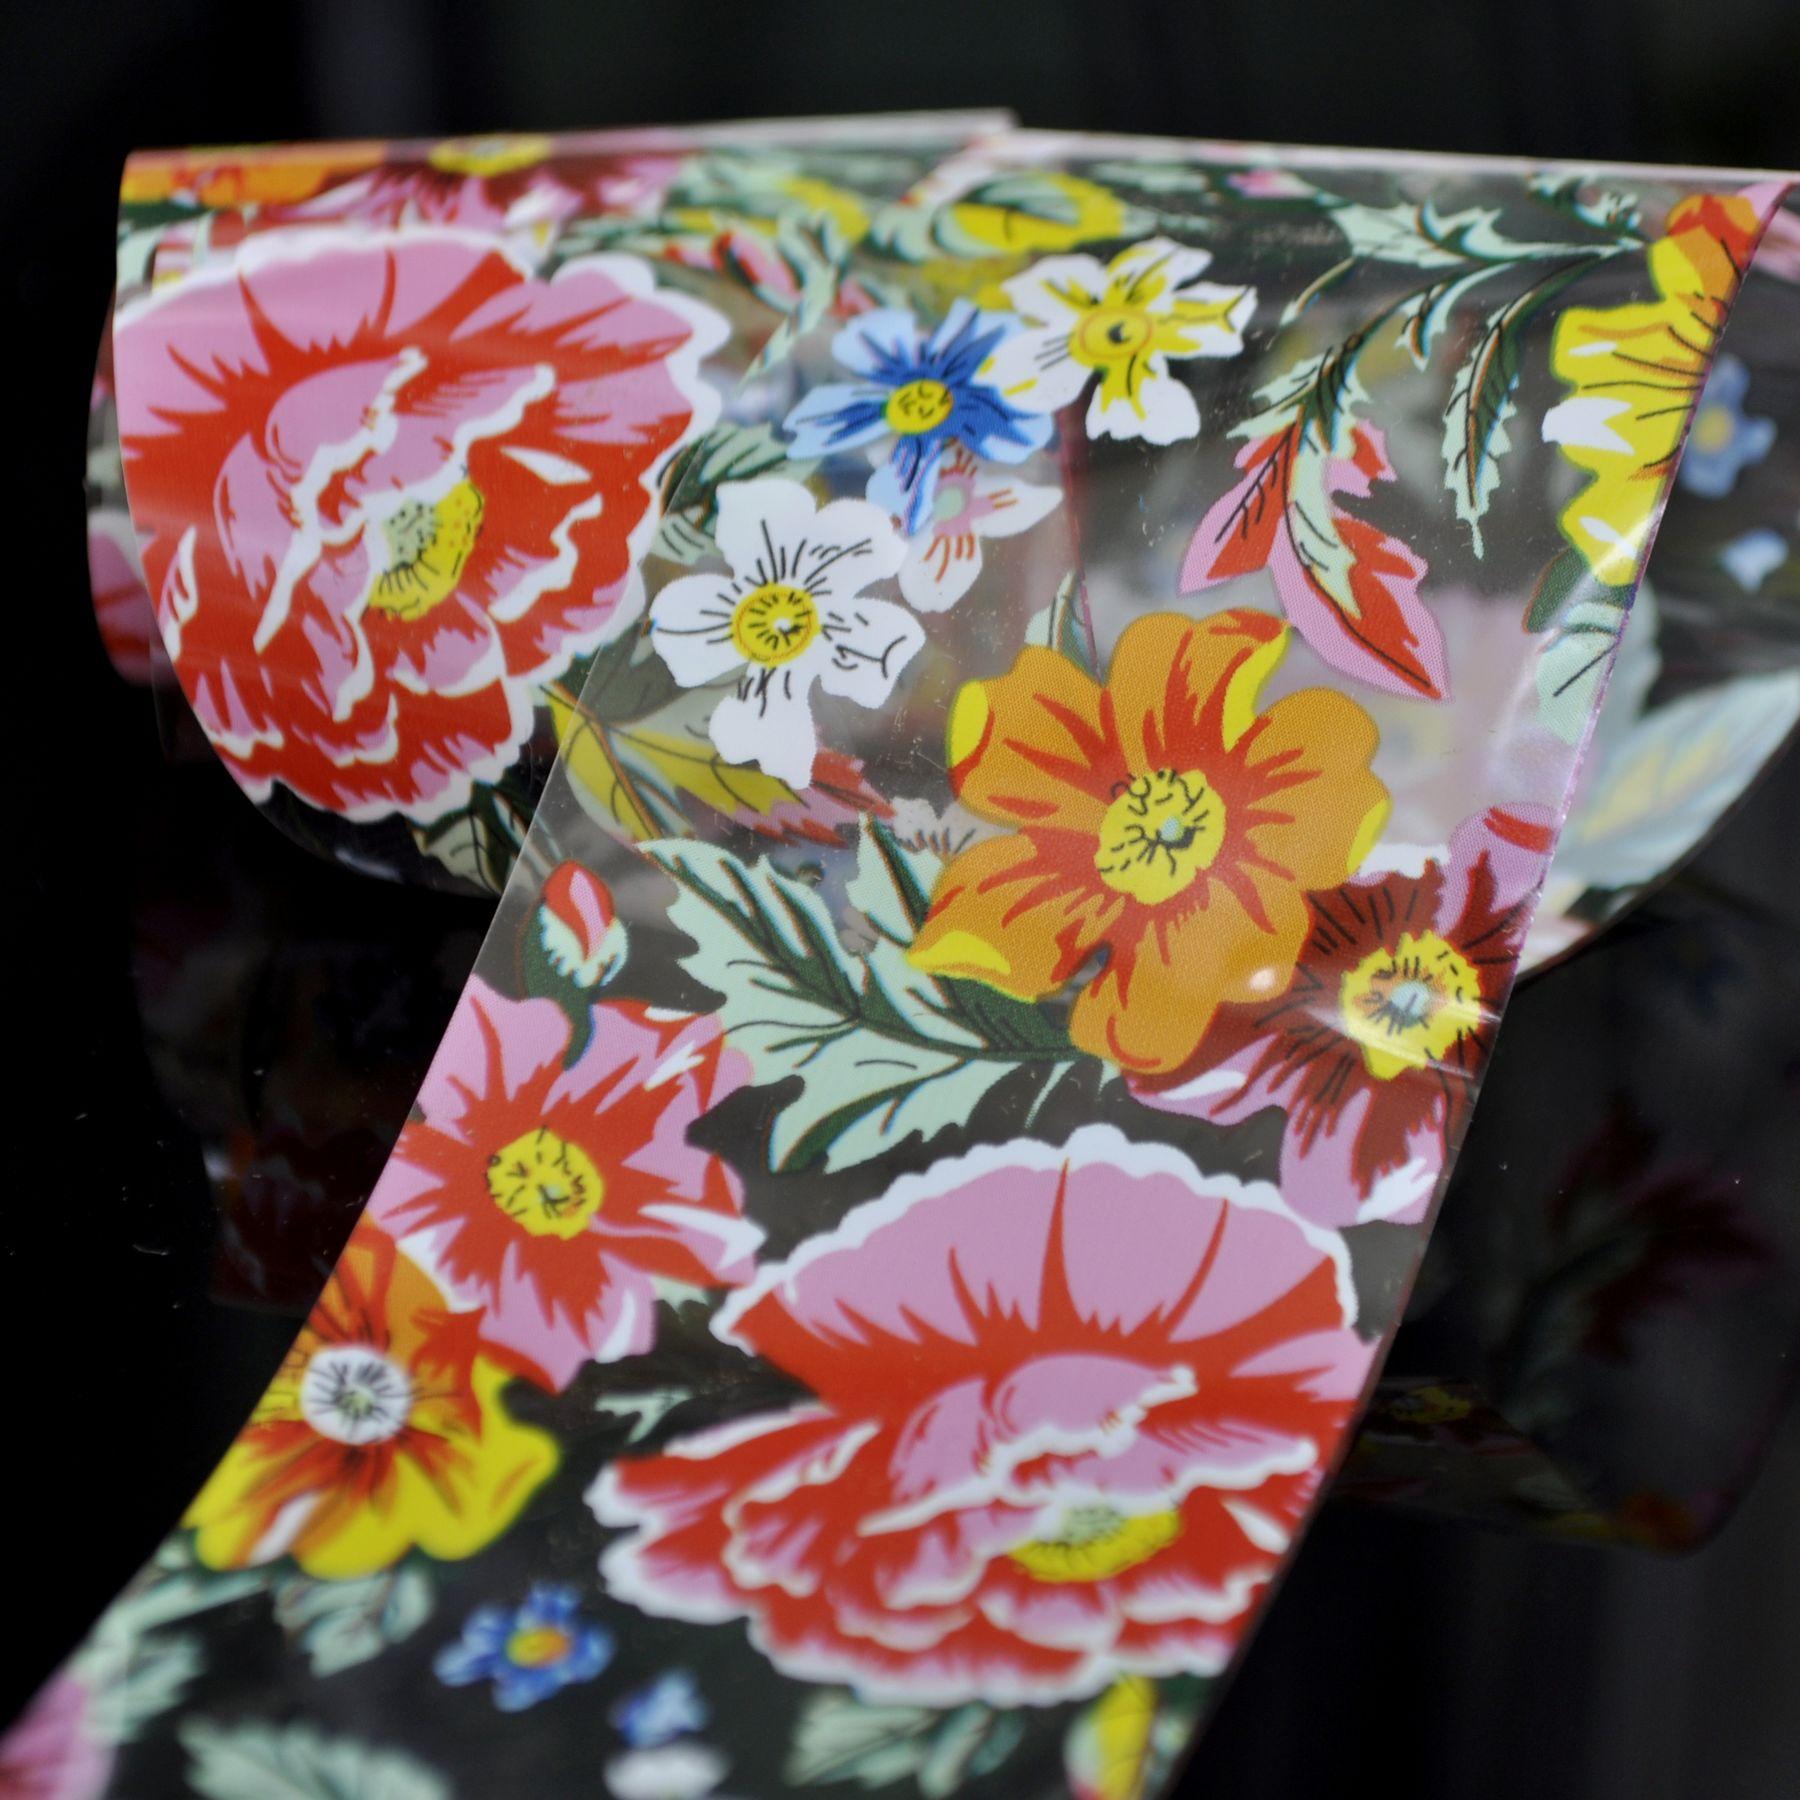 Peony Flower Design Colorful Nail Foil Nail Art Glue Transfer Sticker Roll in Jar 100cm SY624